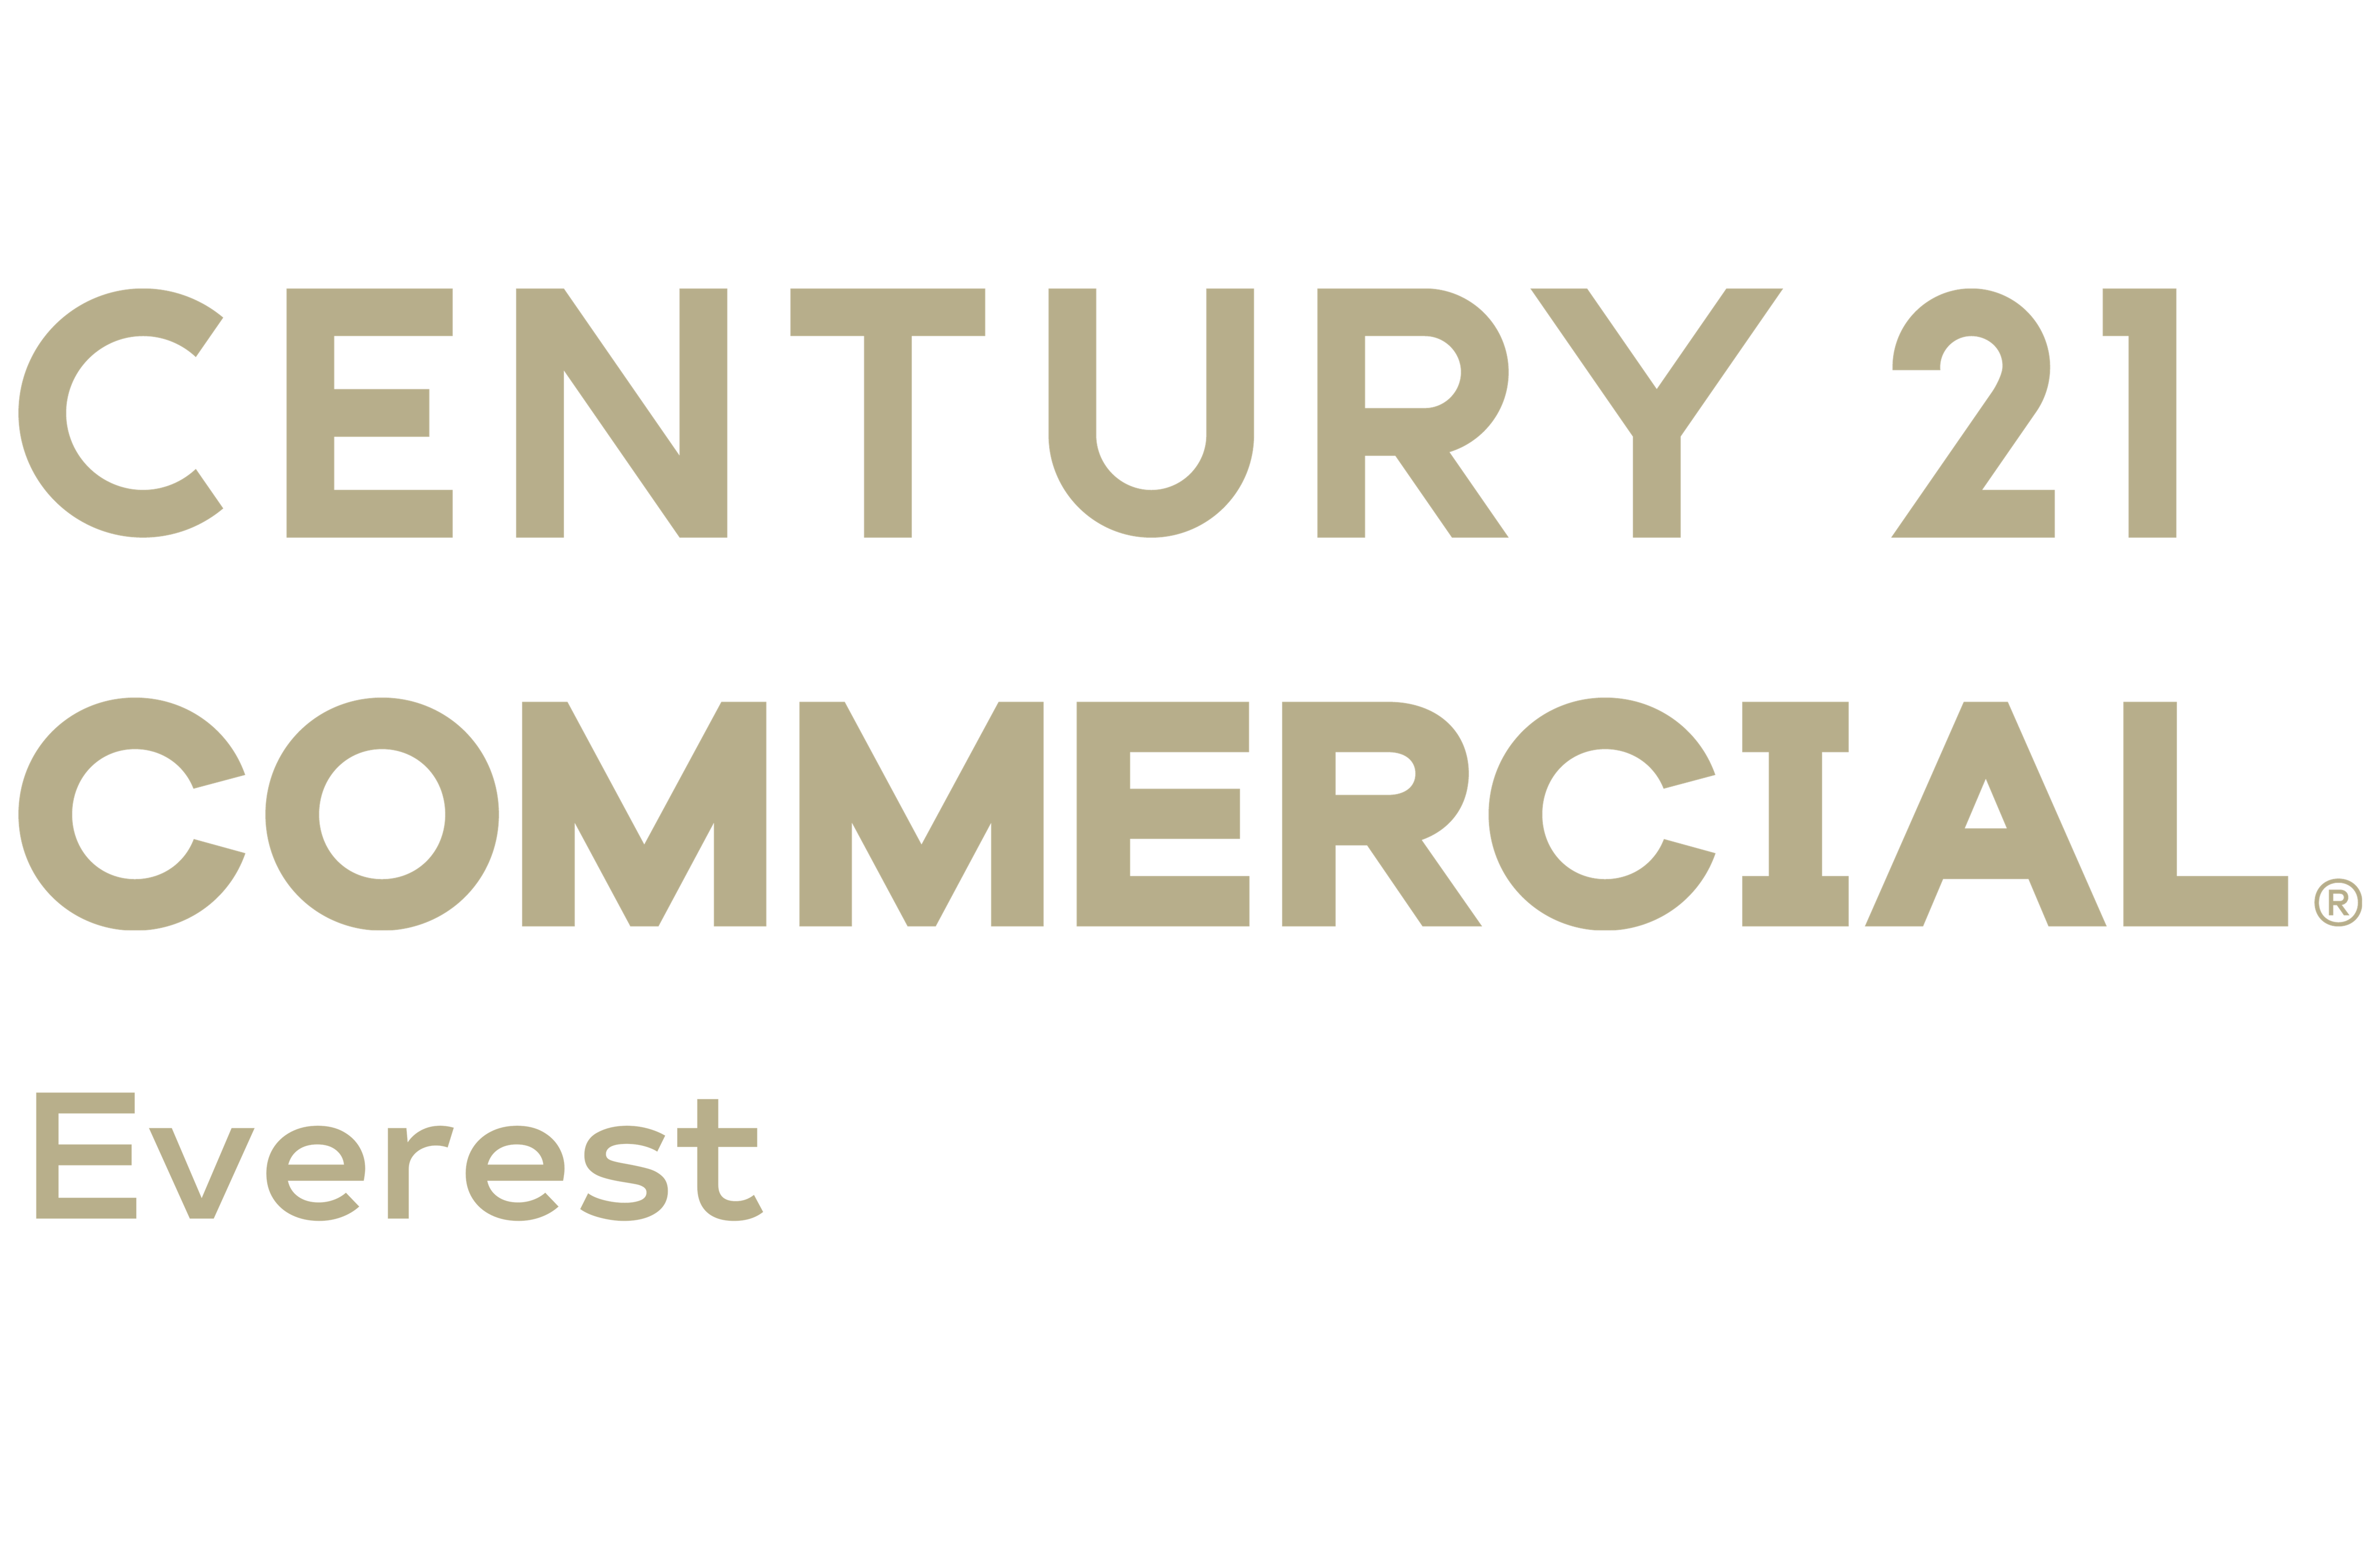 Samuel Newell of CENTURY 21 Everest logo